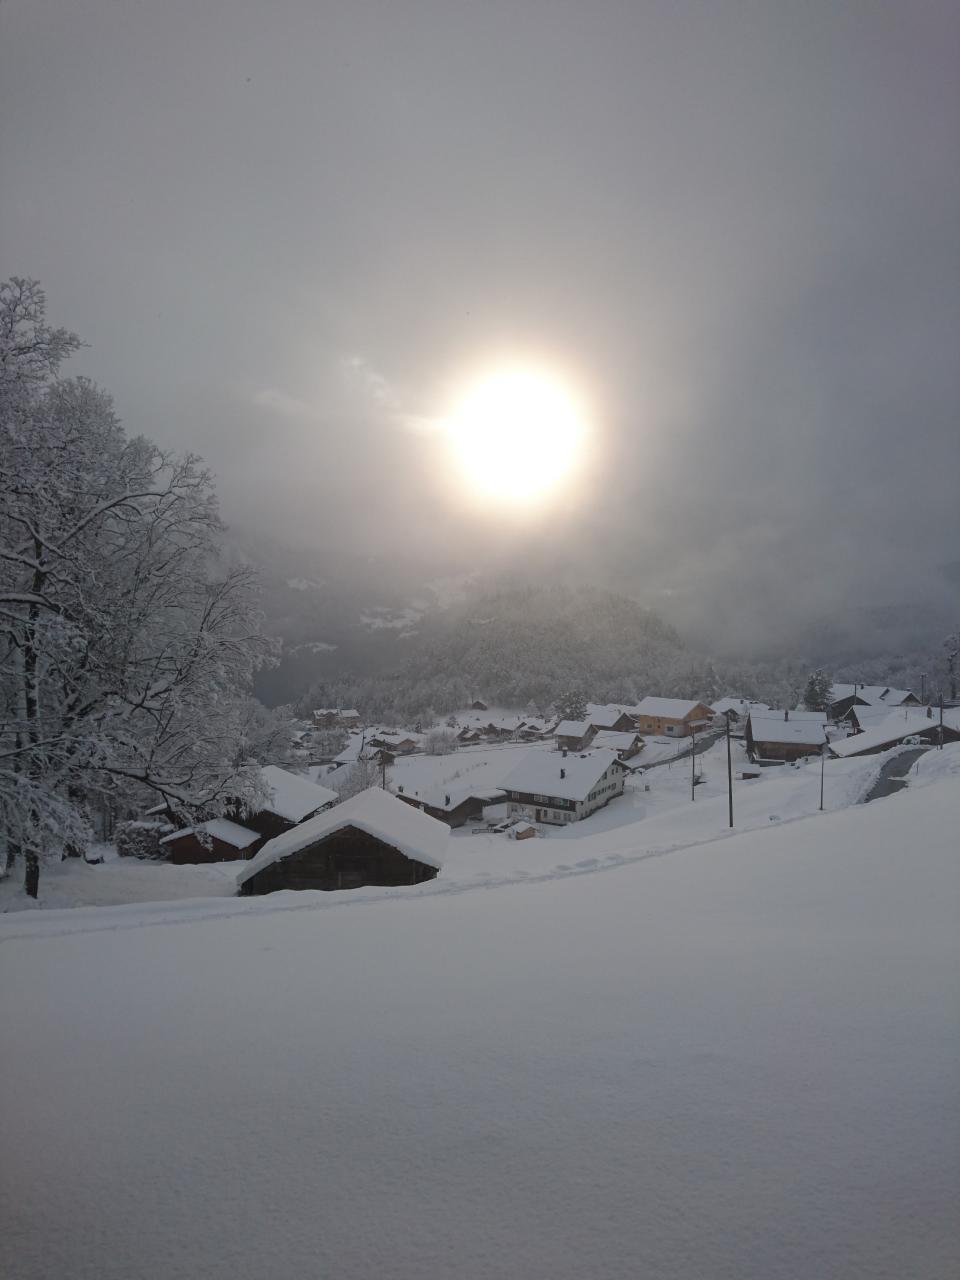 Ferienwohnung Obererli 4-Bettwohnung (2692316), Hasliberg Hohfluh, Meiringen - Hasliberg, Berner Oberland, Schweiz, Bild 19